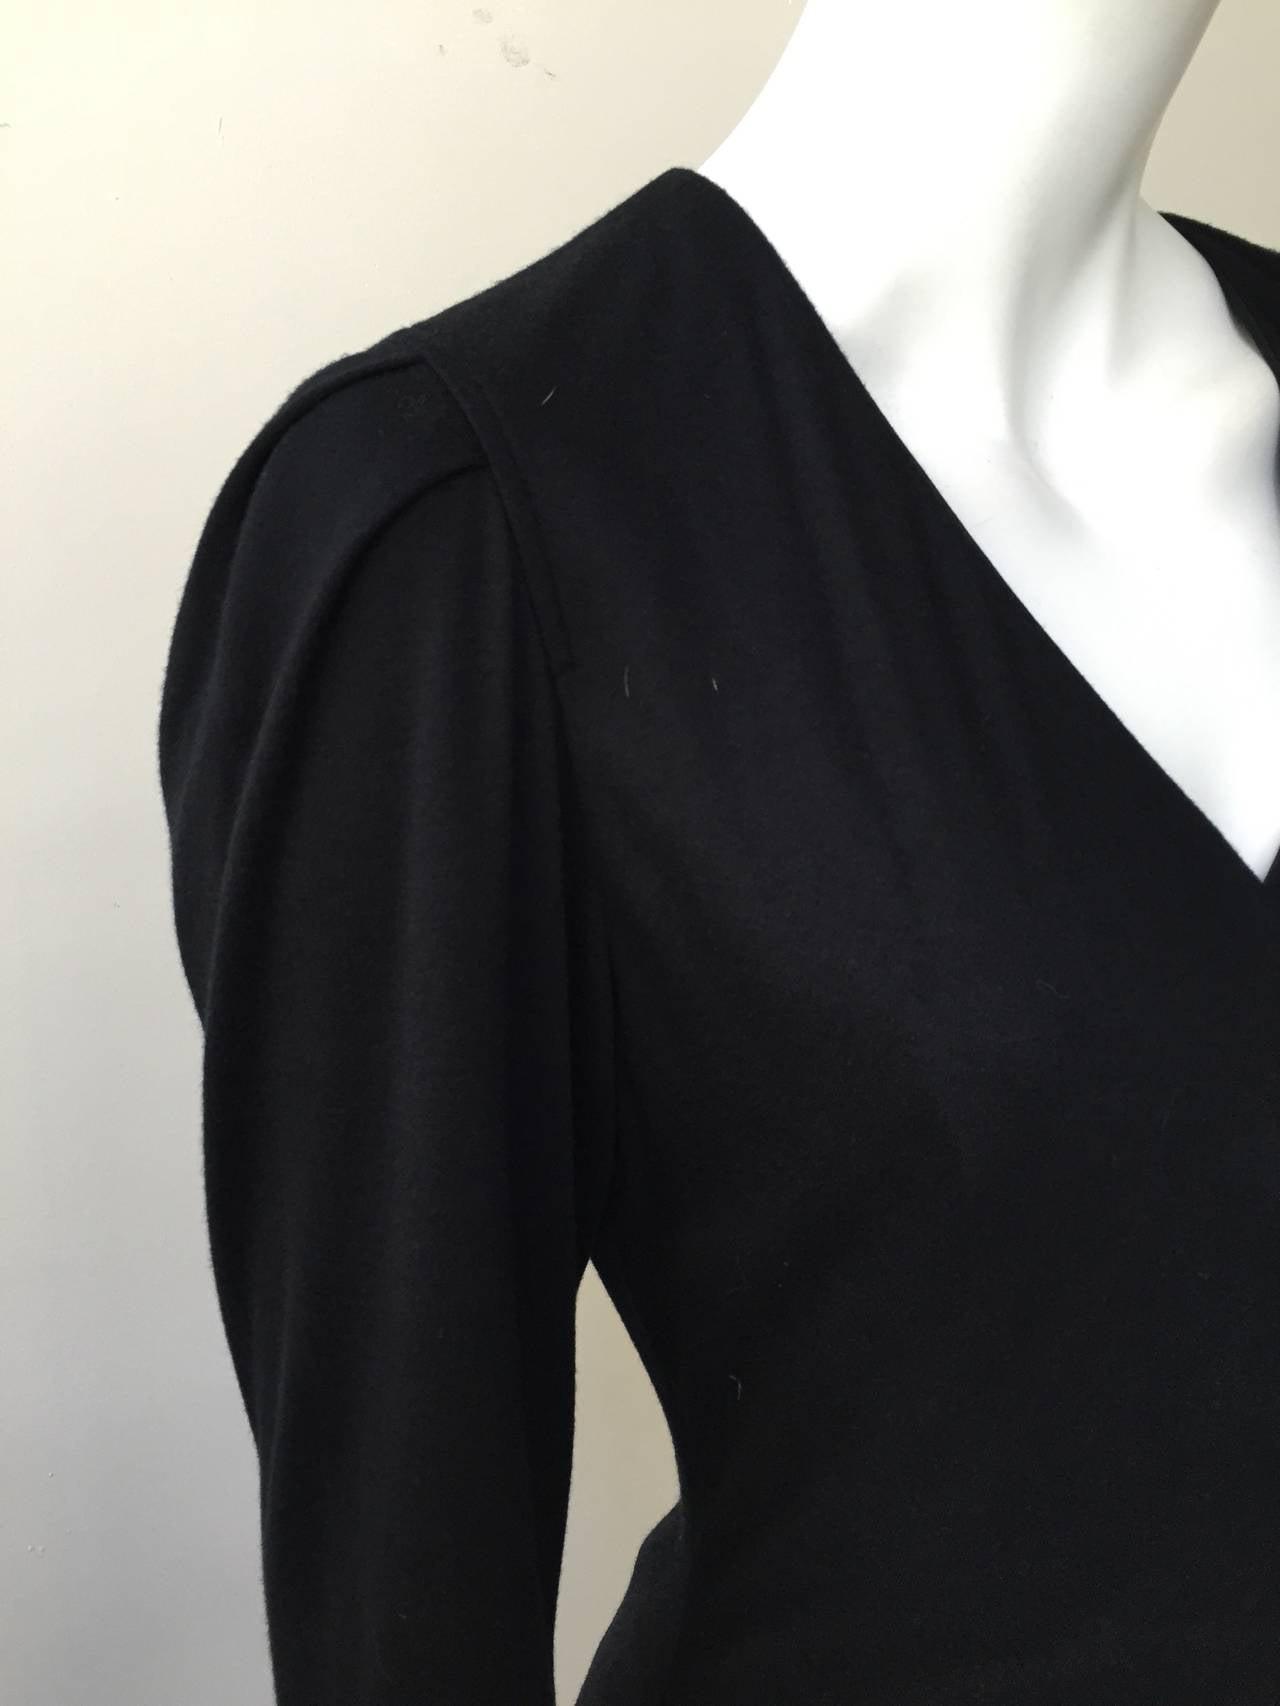 Zandra Rhodes 1980s Black with Sequin Dress Size 6. 6